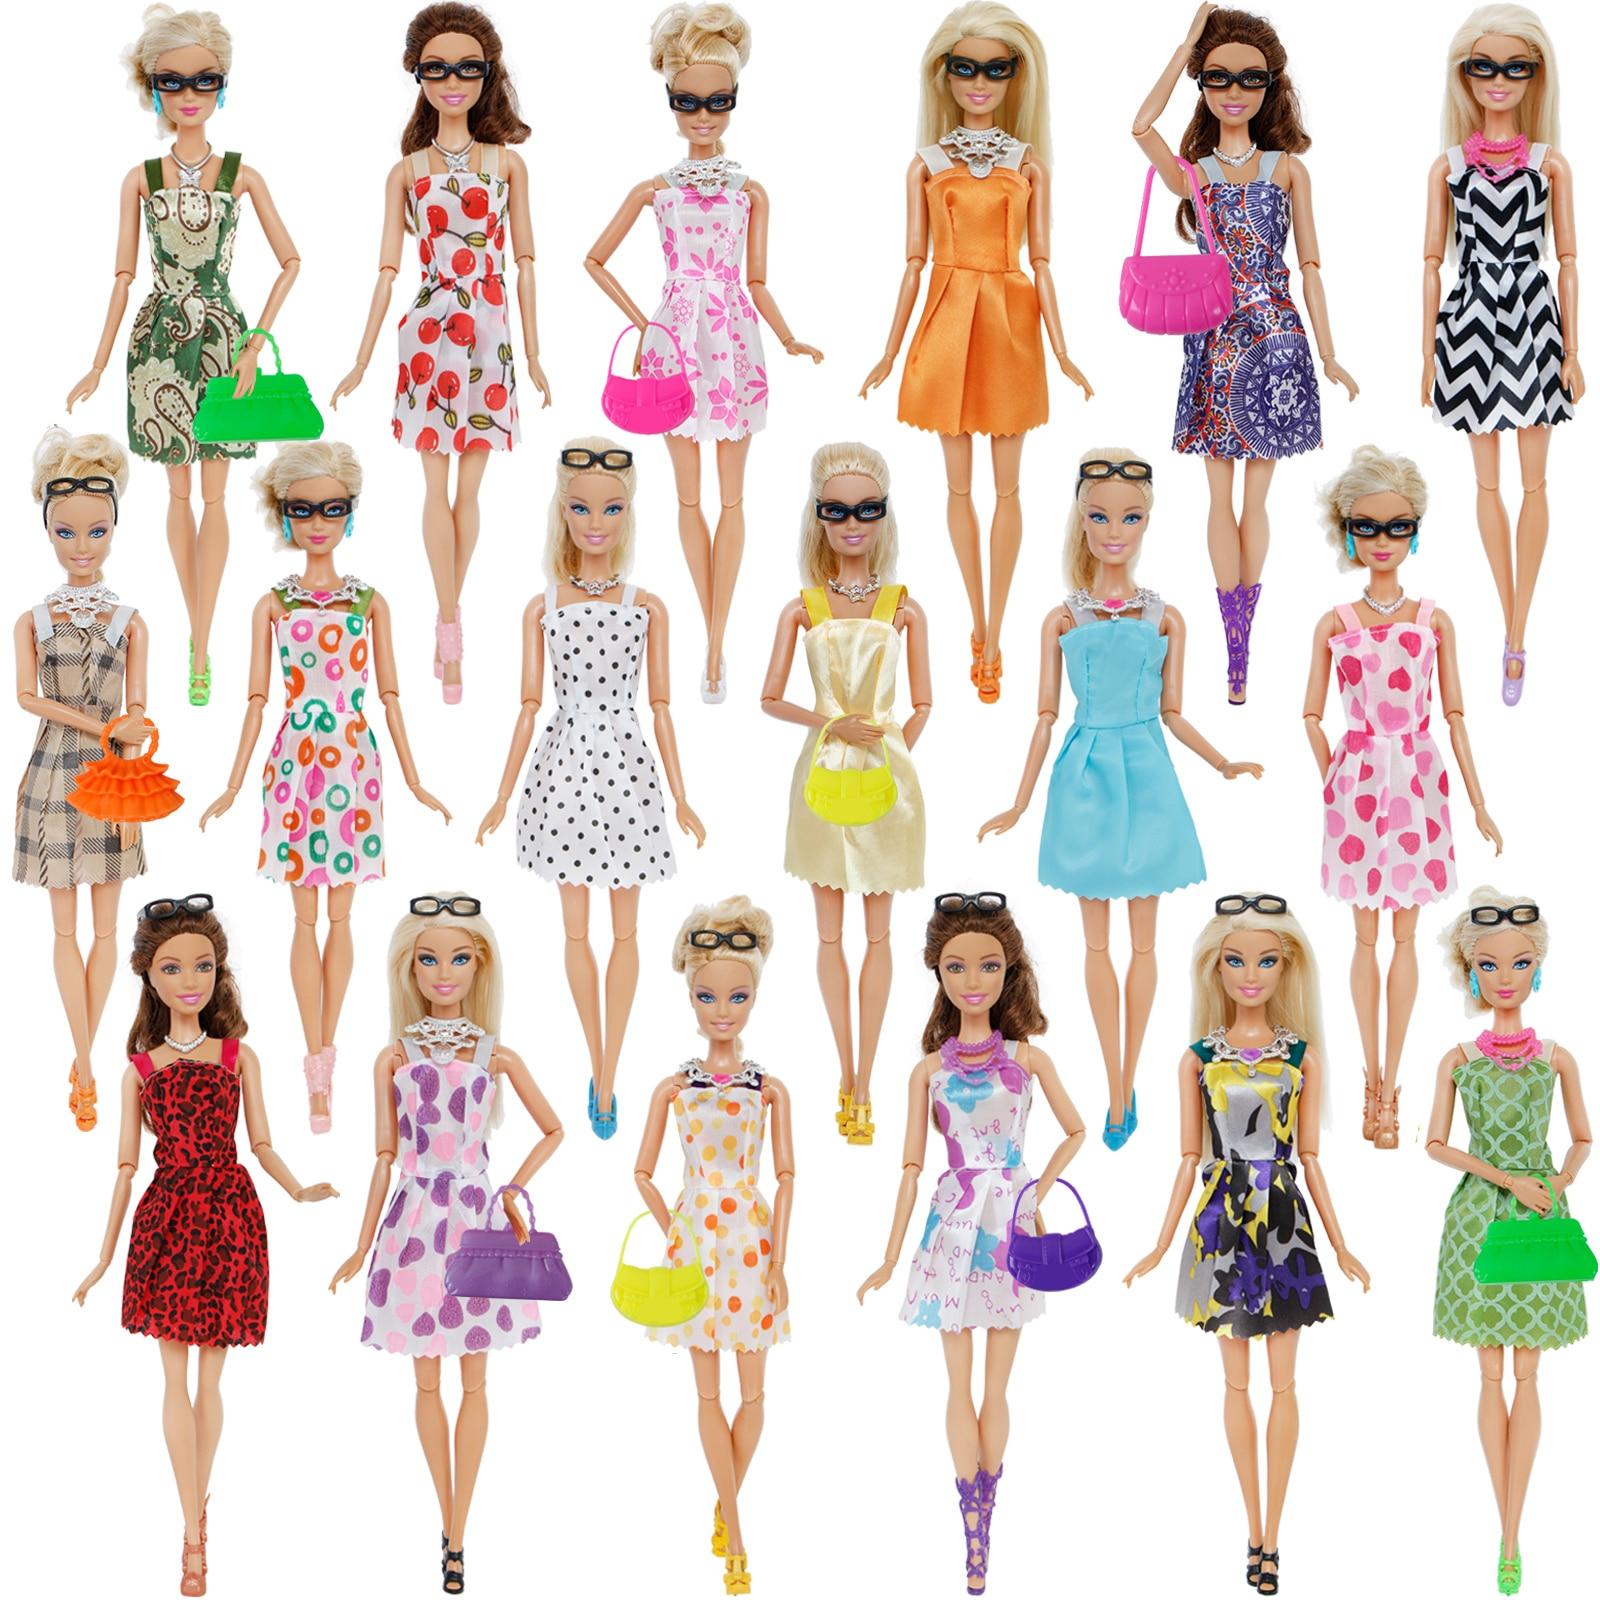 32 Accesorios para Muñecas=10 Vestido+4 Lentes+6 Collar de plastico+10 zapatos